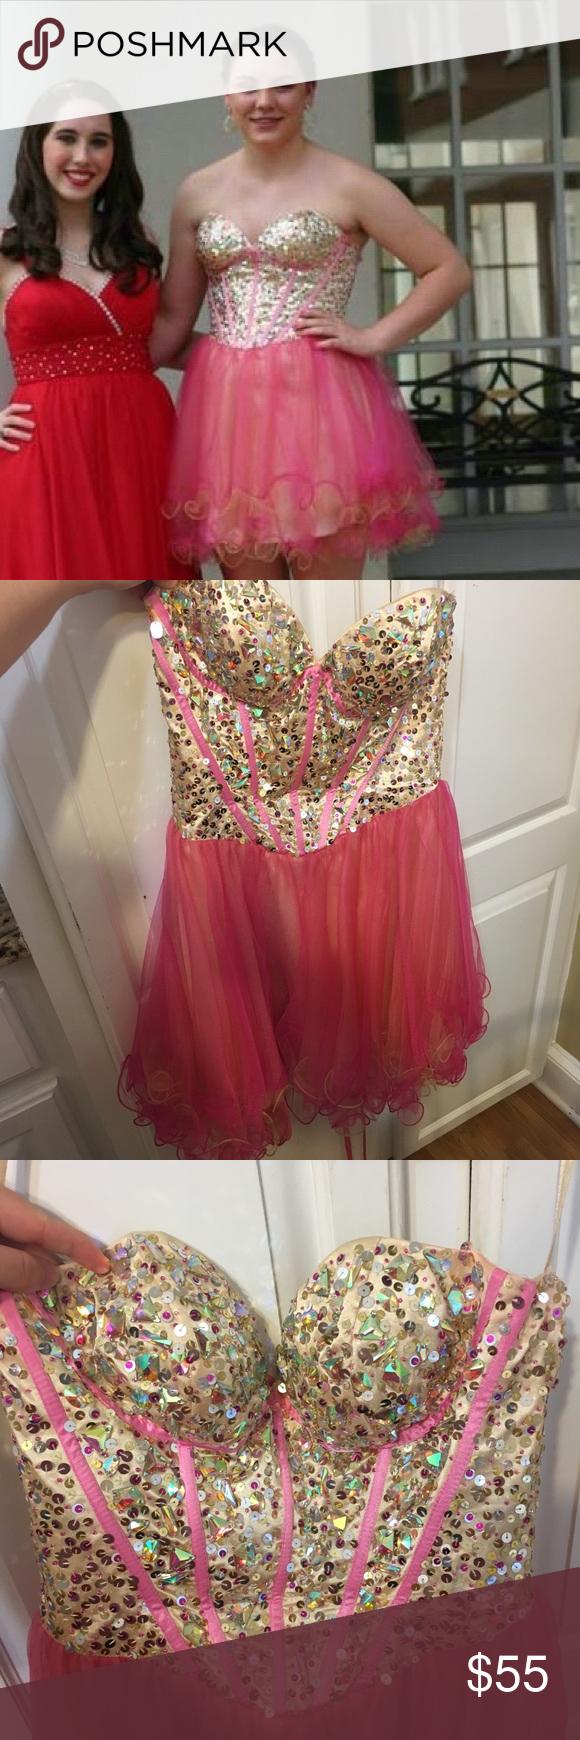 May queen short prom dress my posh closet pinterest short prom